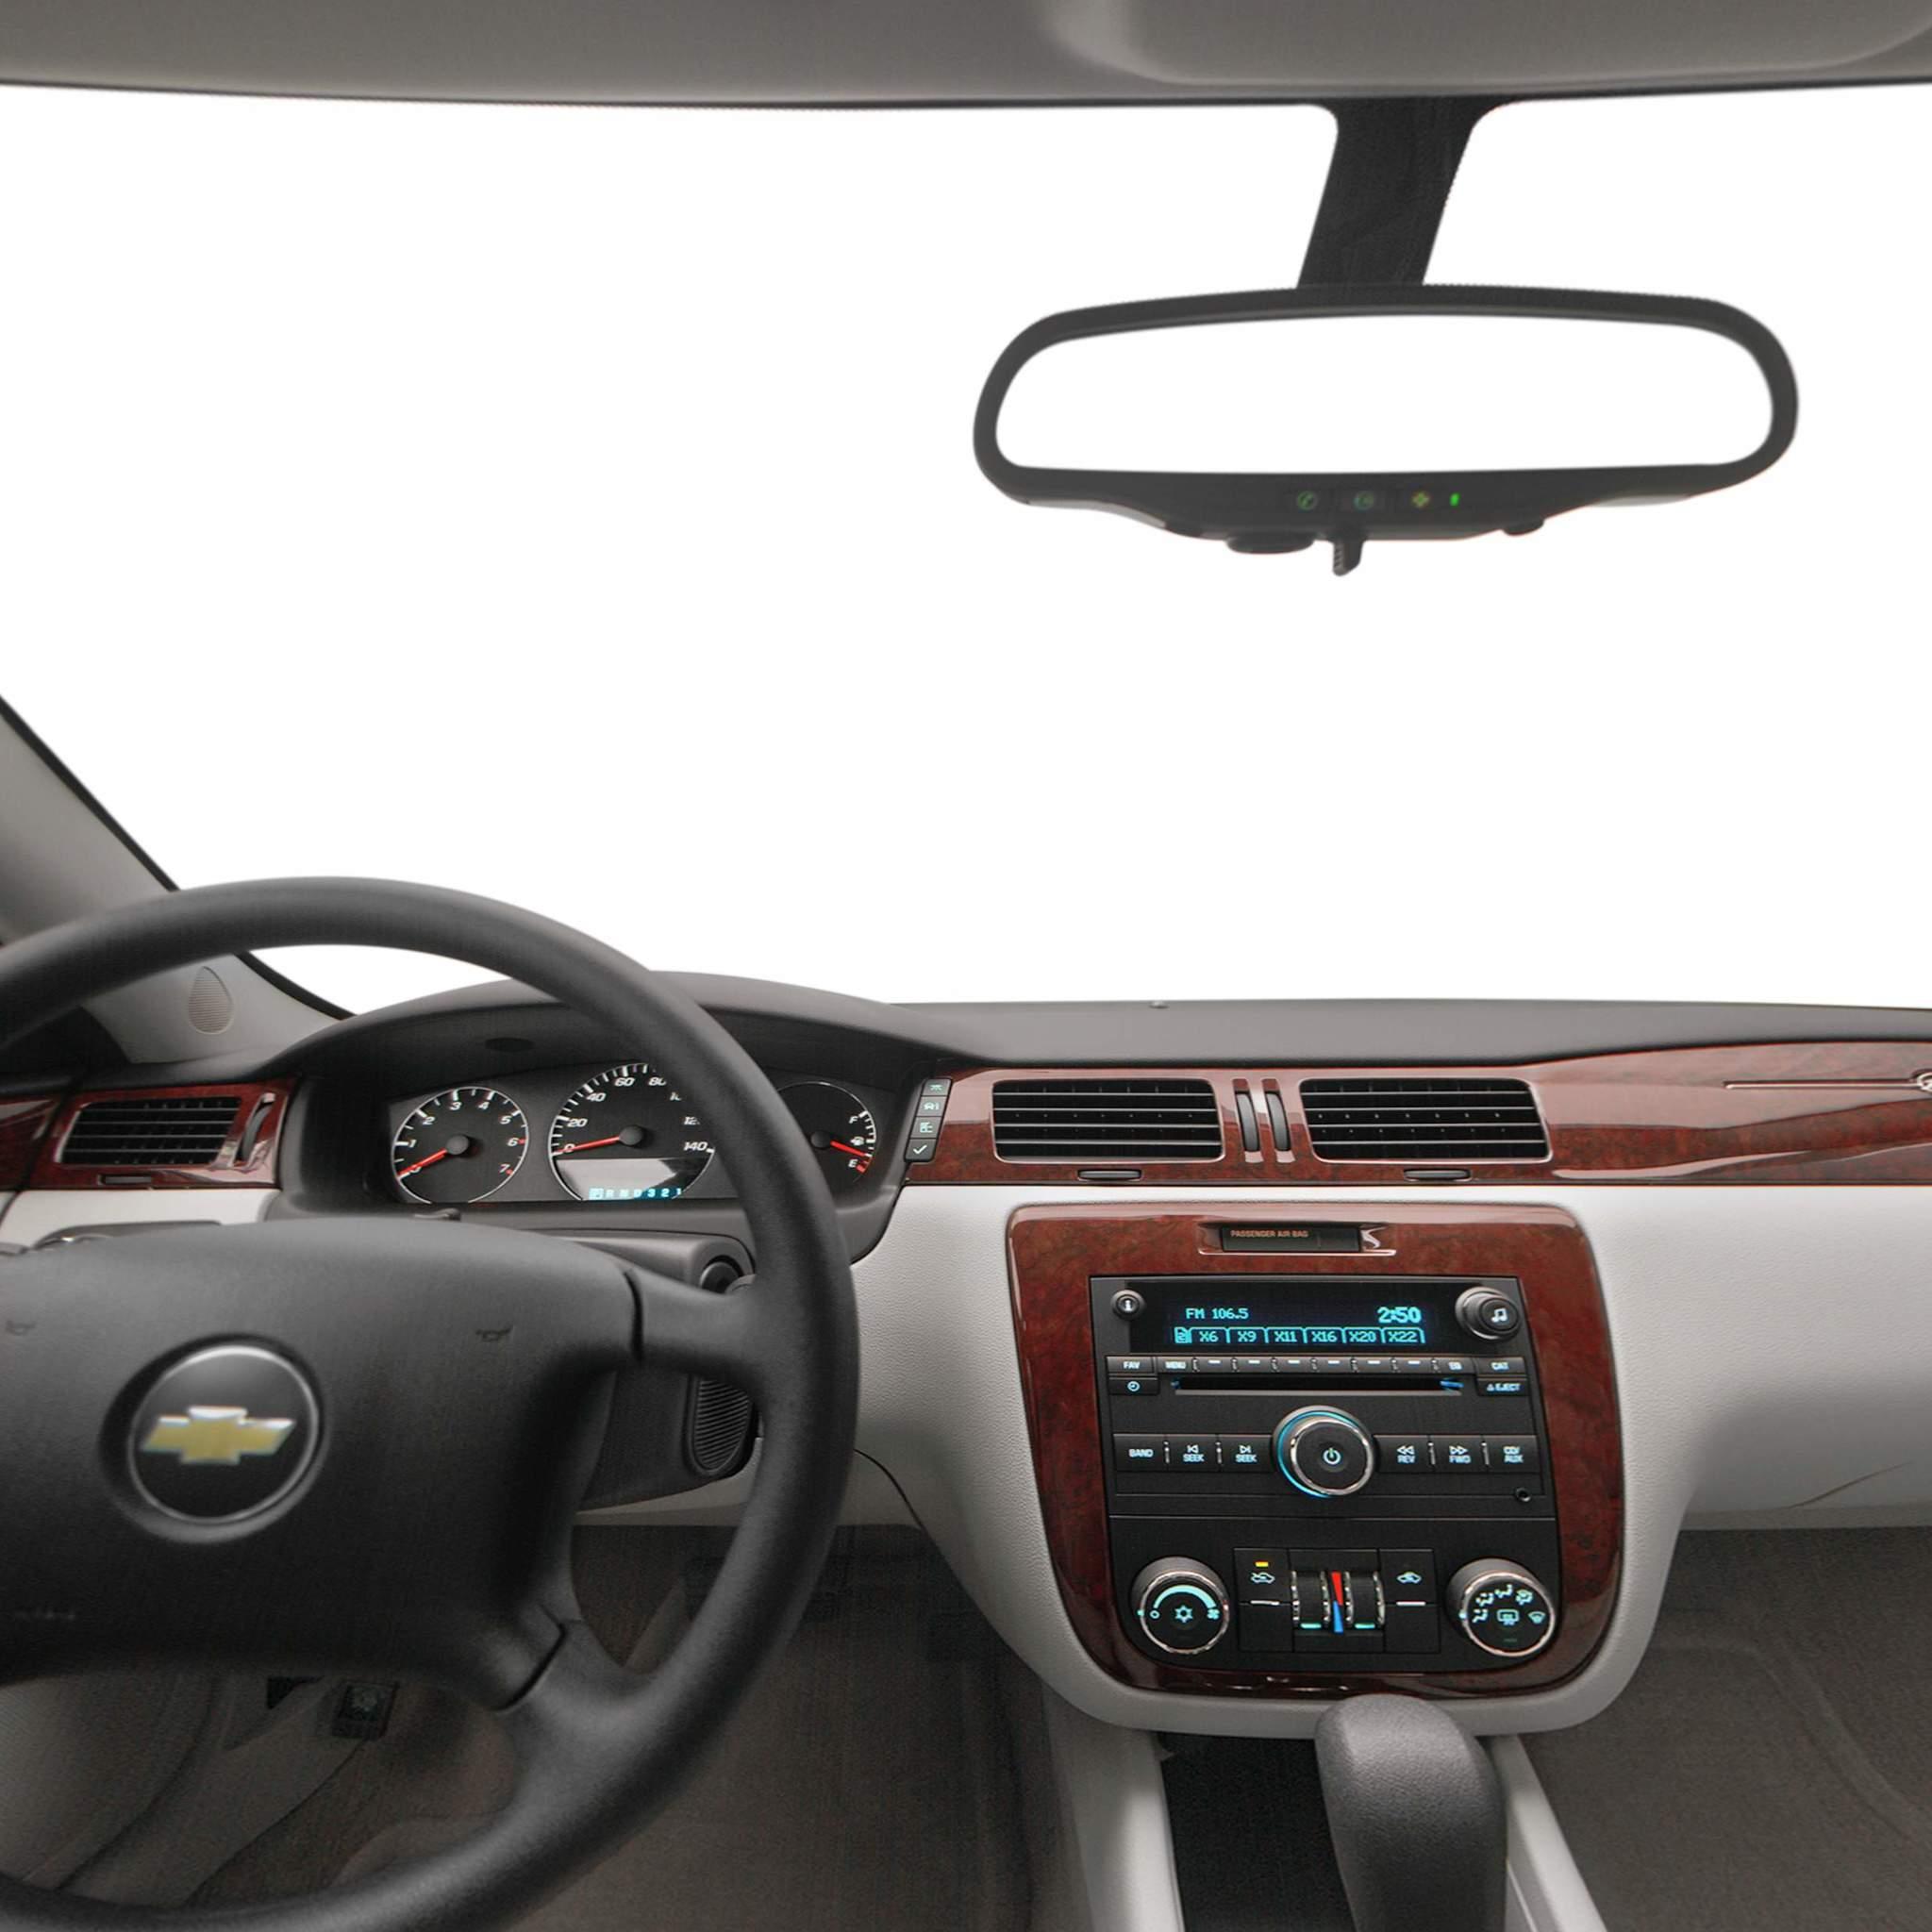 2008 Chevrolet Impala LT Low Km s No Accidents